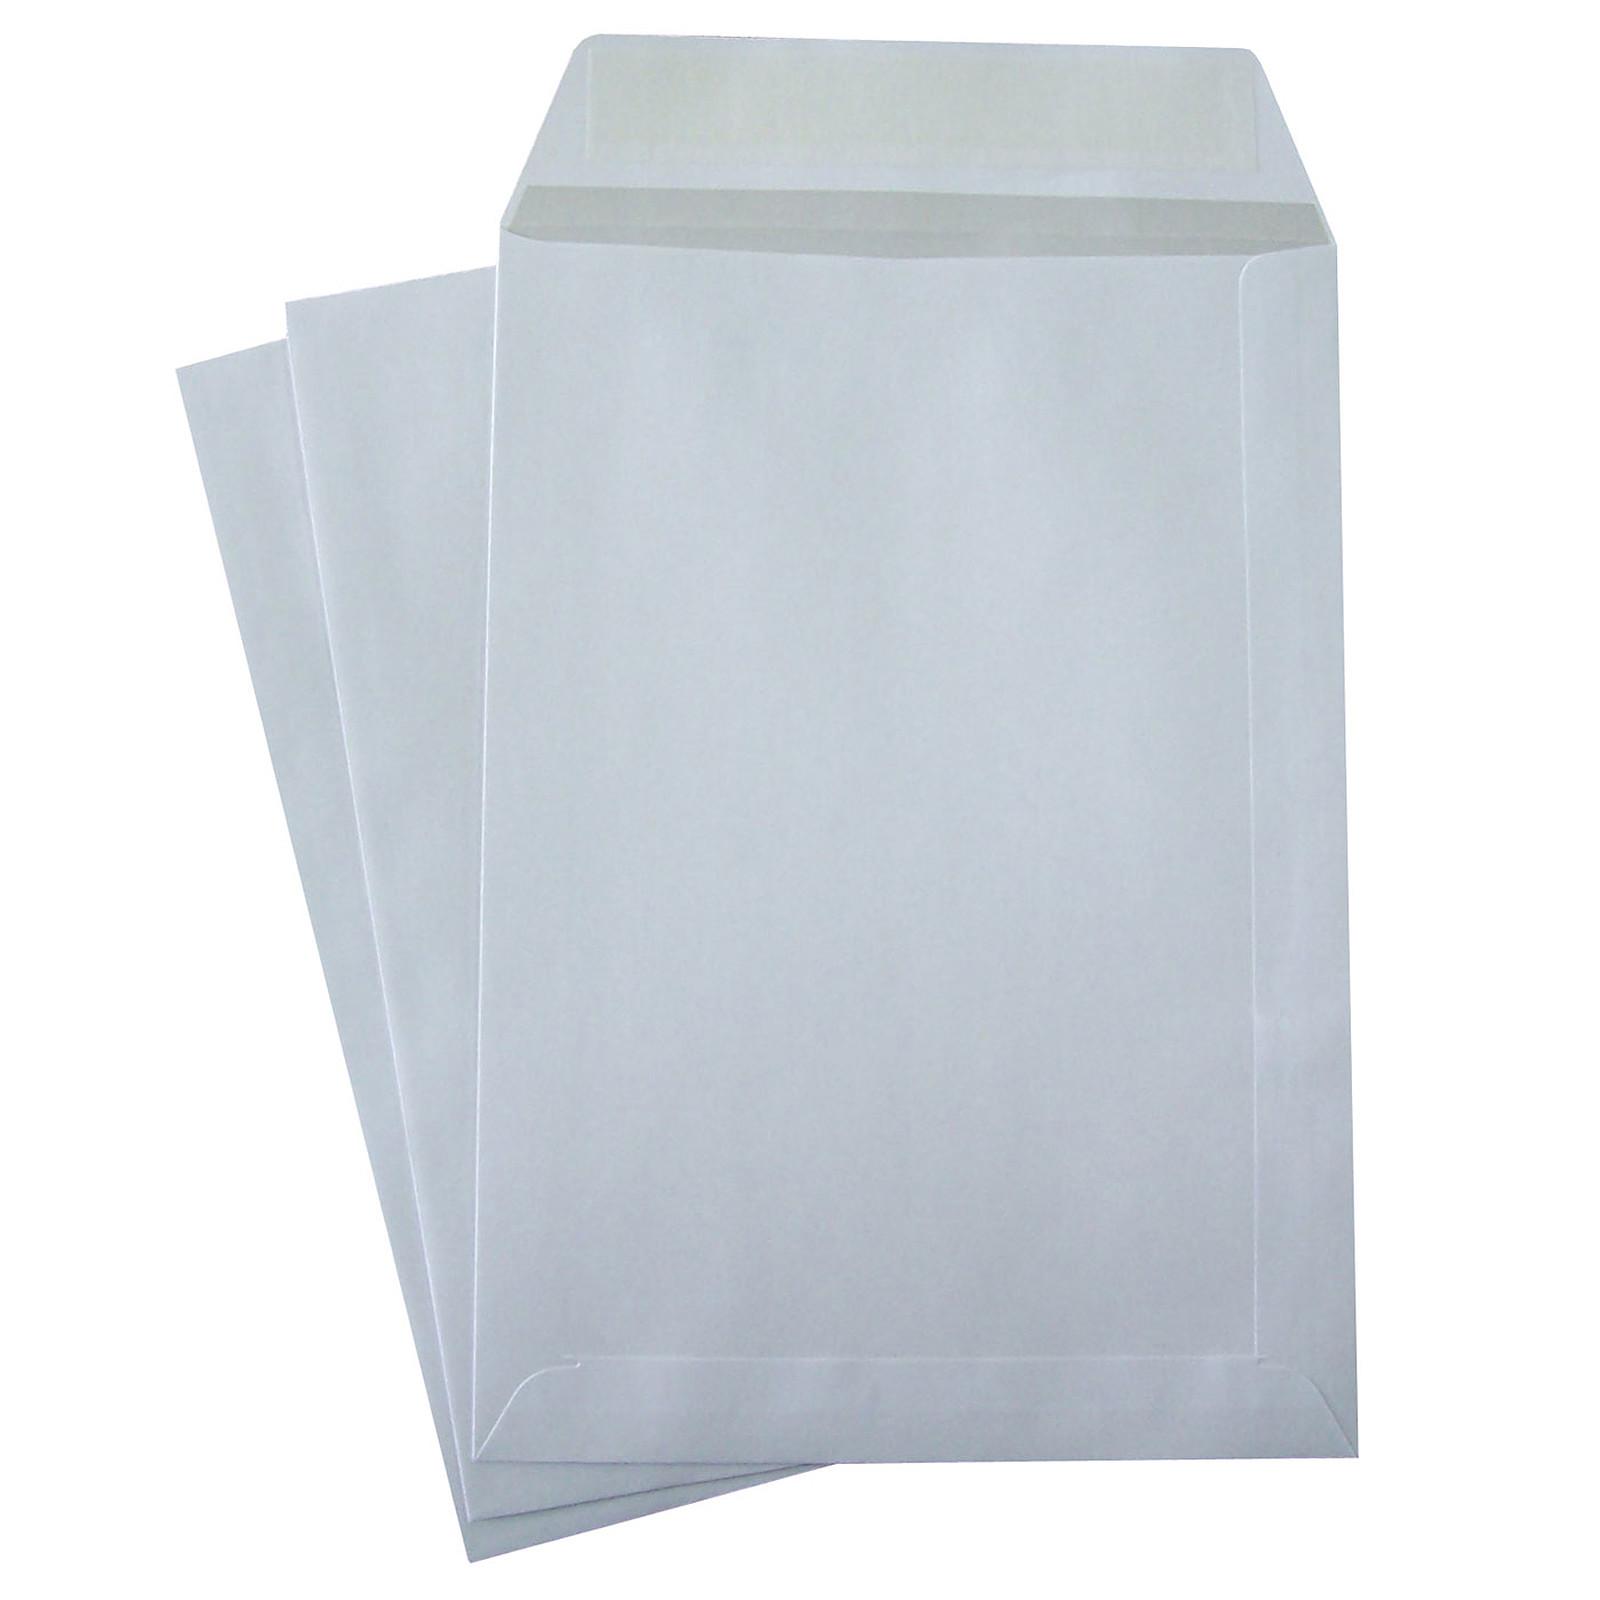 The White Vellum Pockets Crown C5 Autoadhesivo 90g x 50g